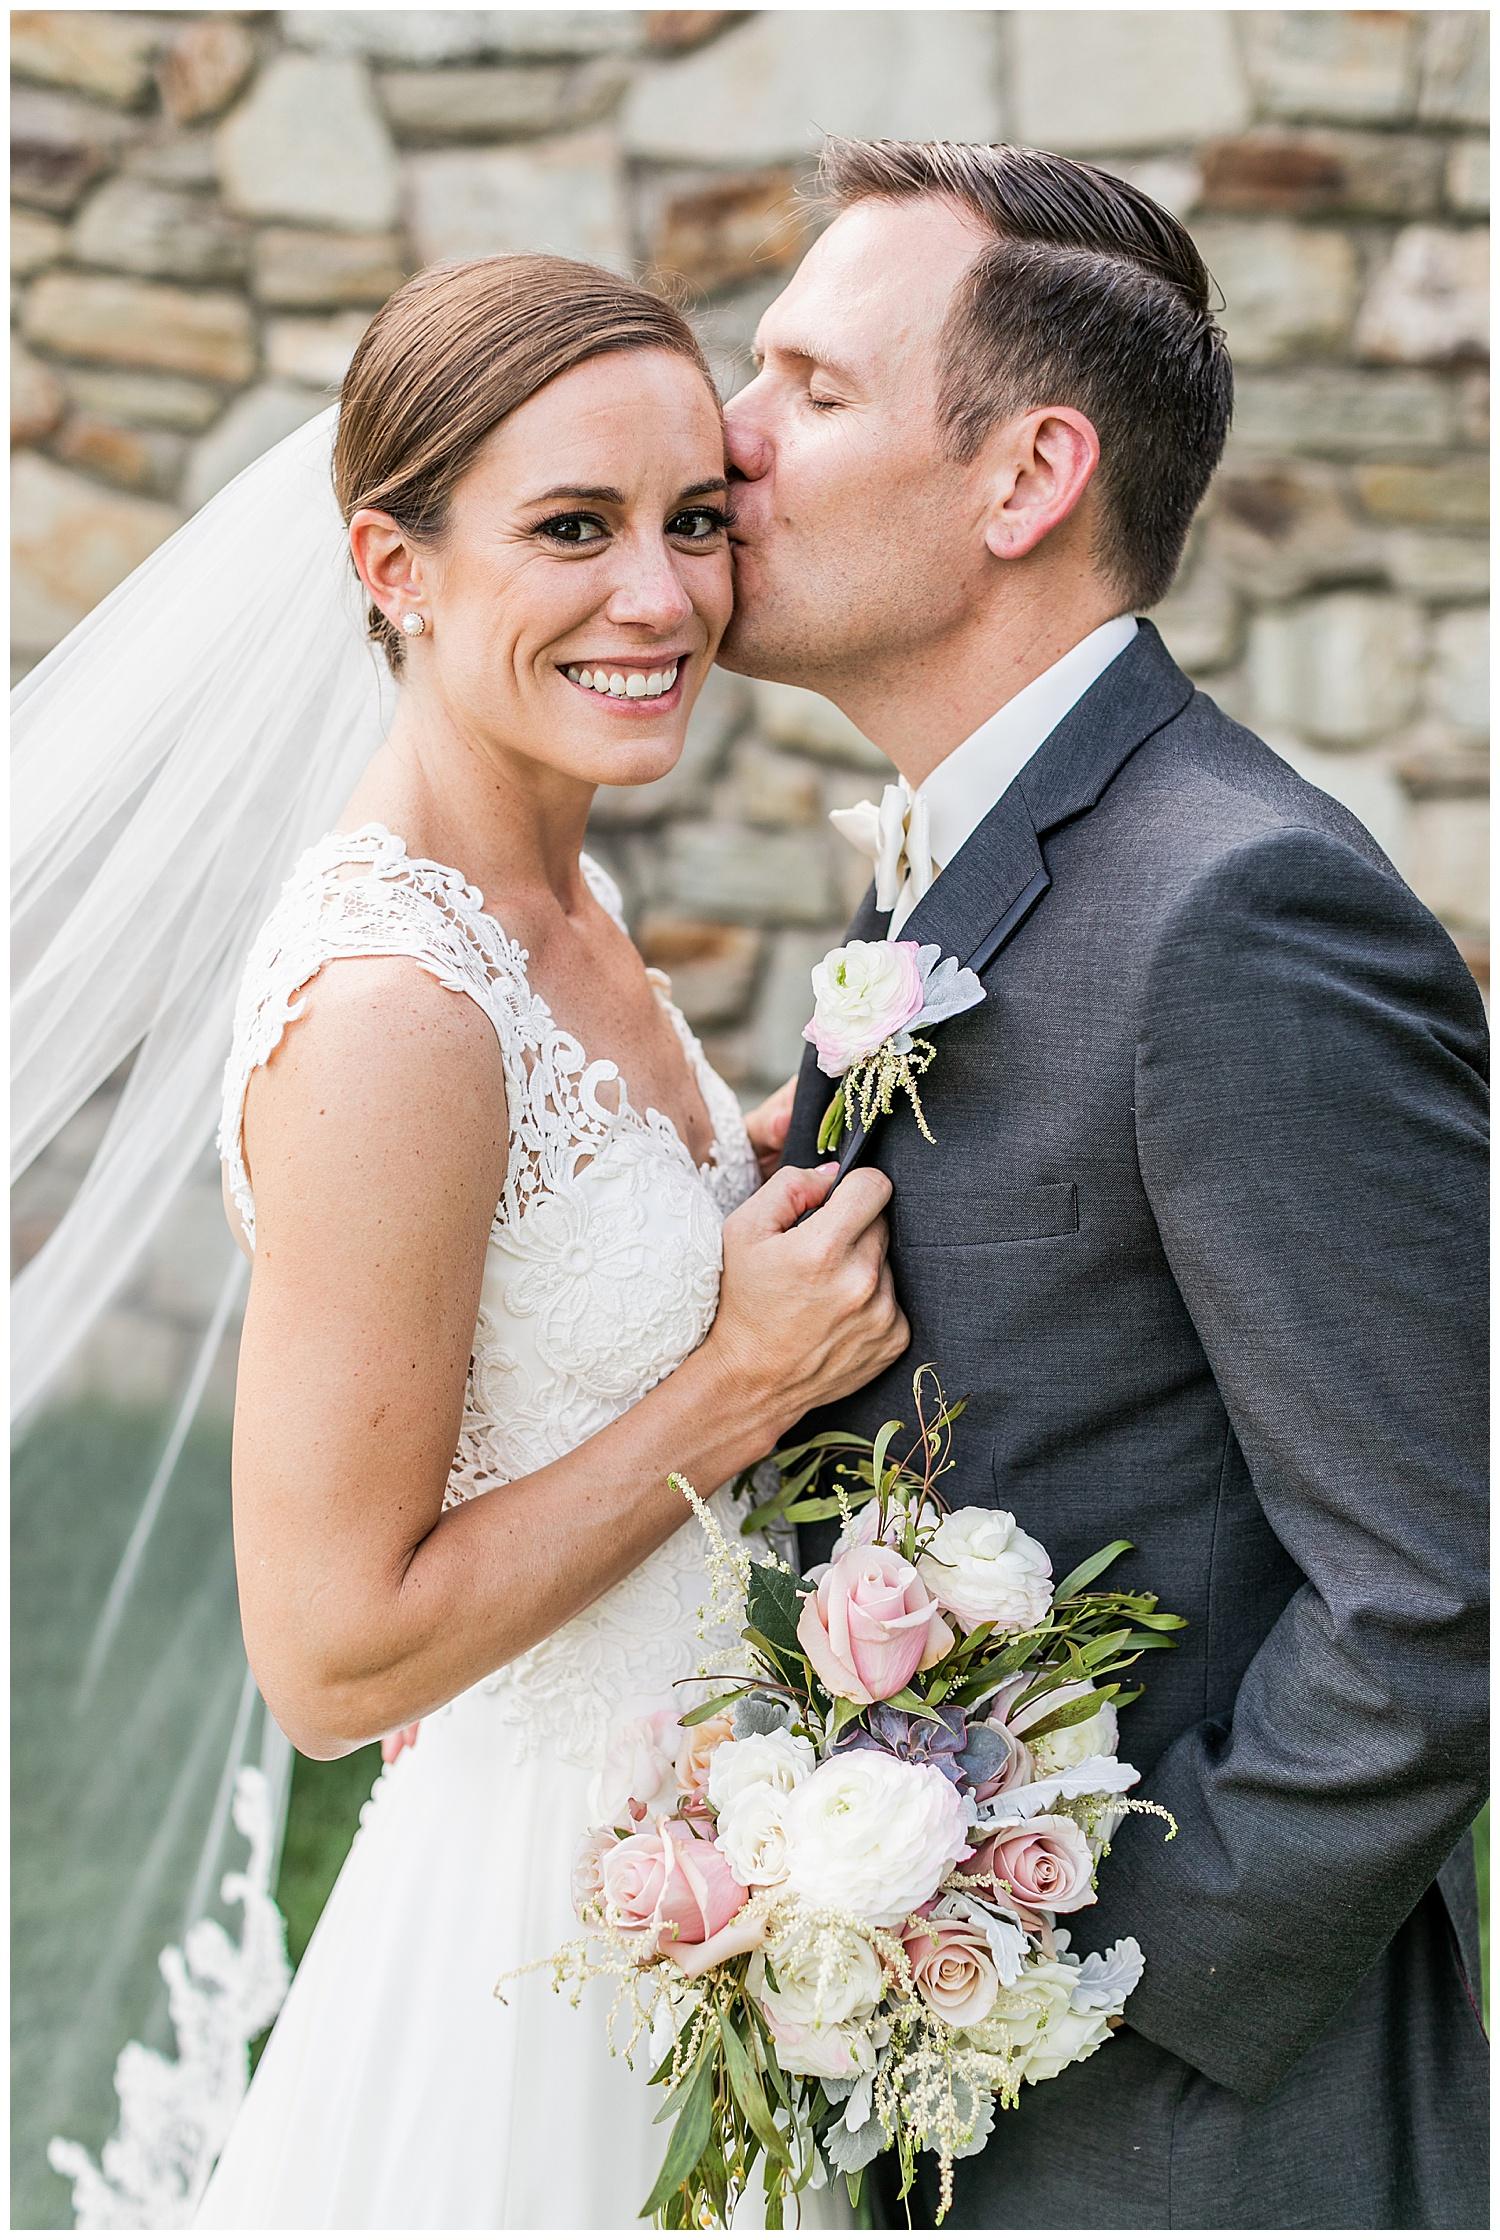 Lindsay Josh Eagles Nest Country Club Wedding Living Radiant Photography photos_0062.jpg